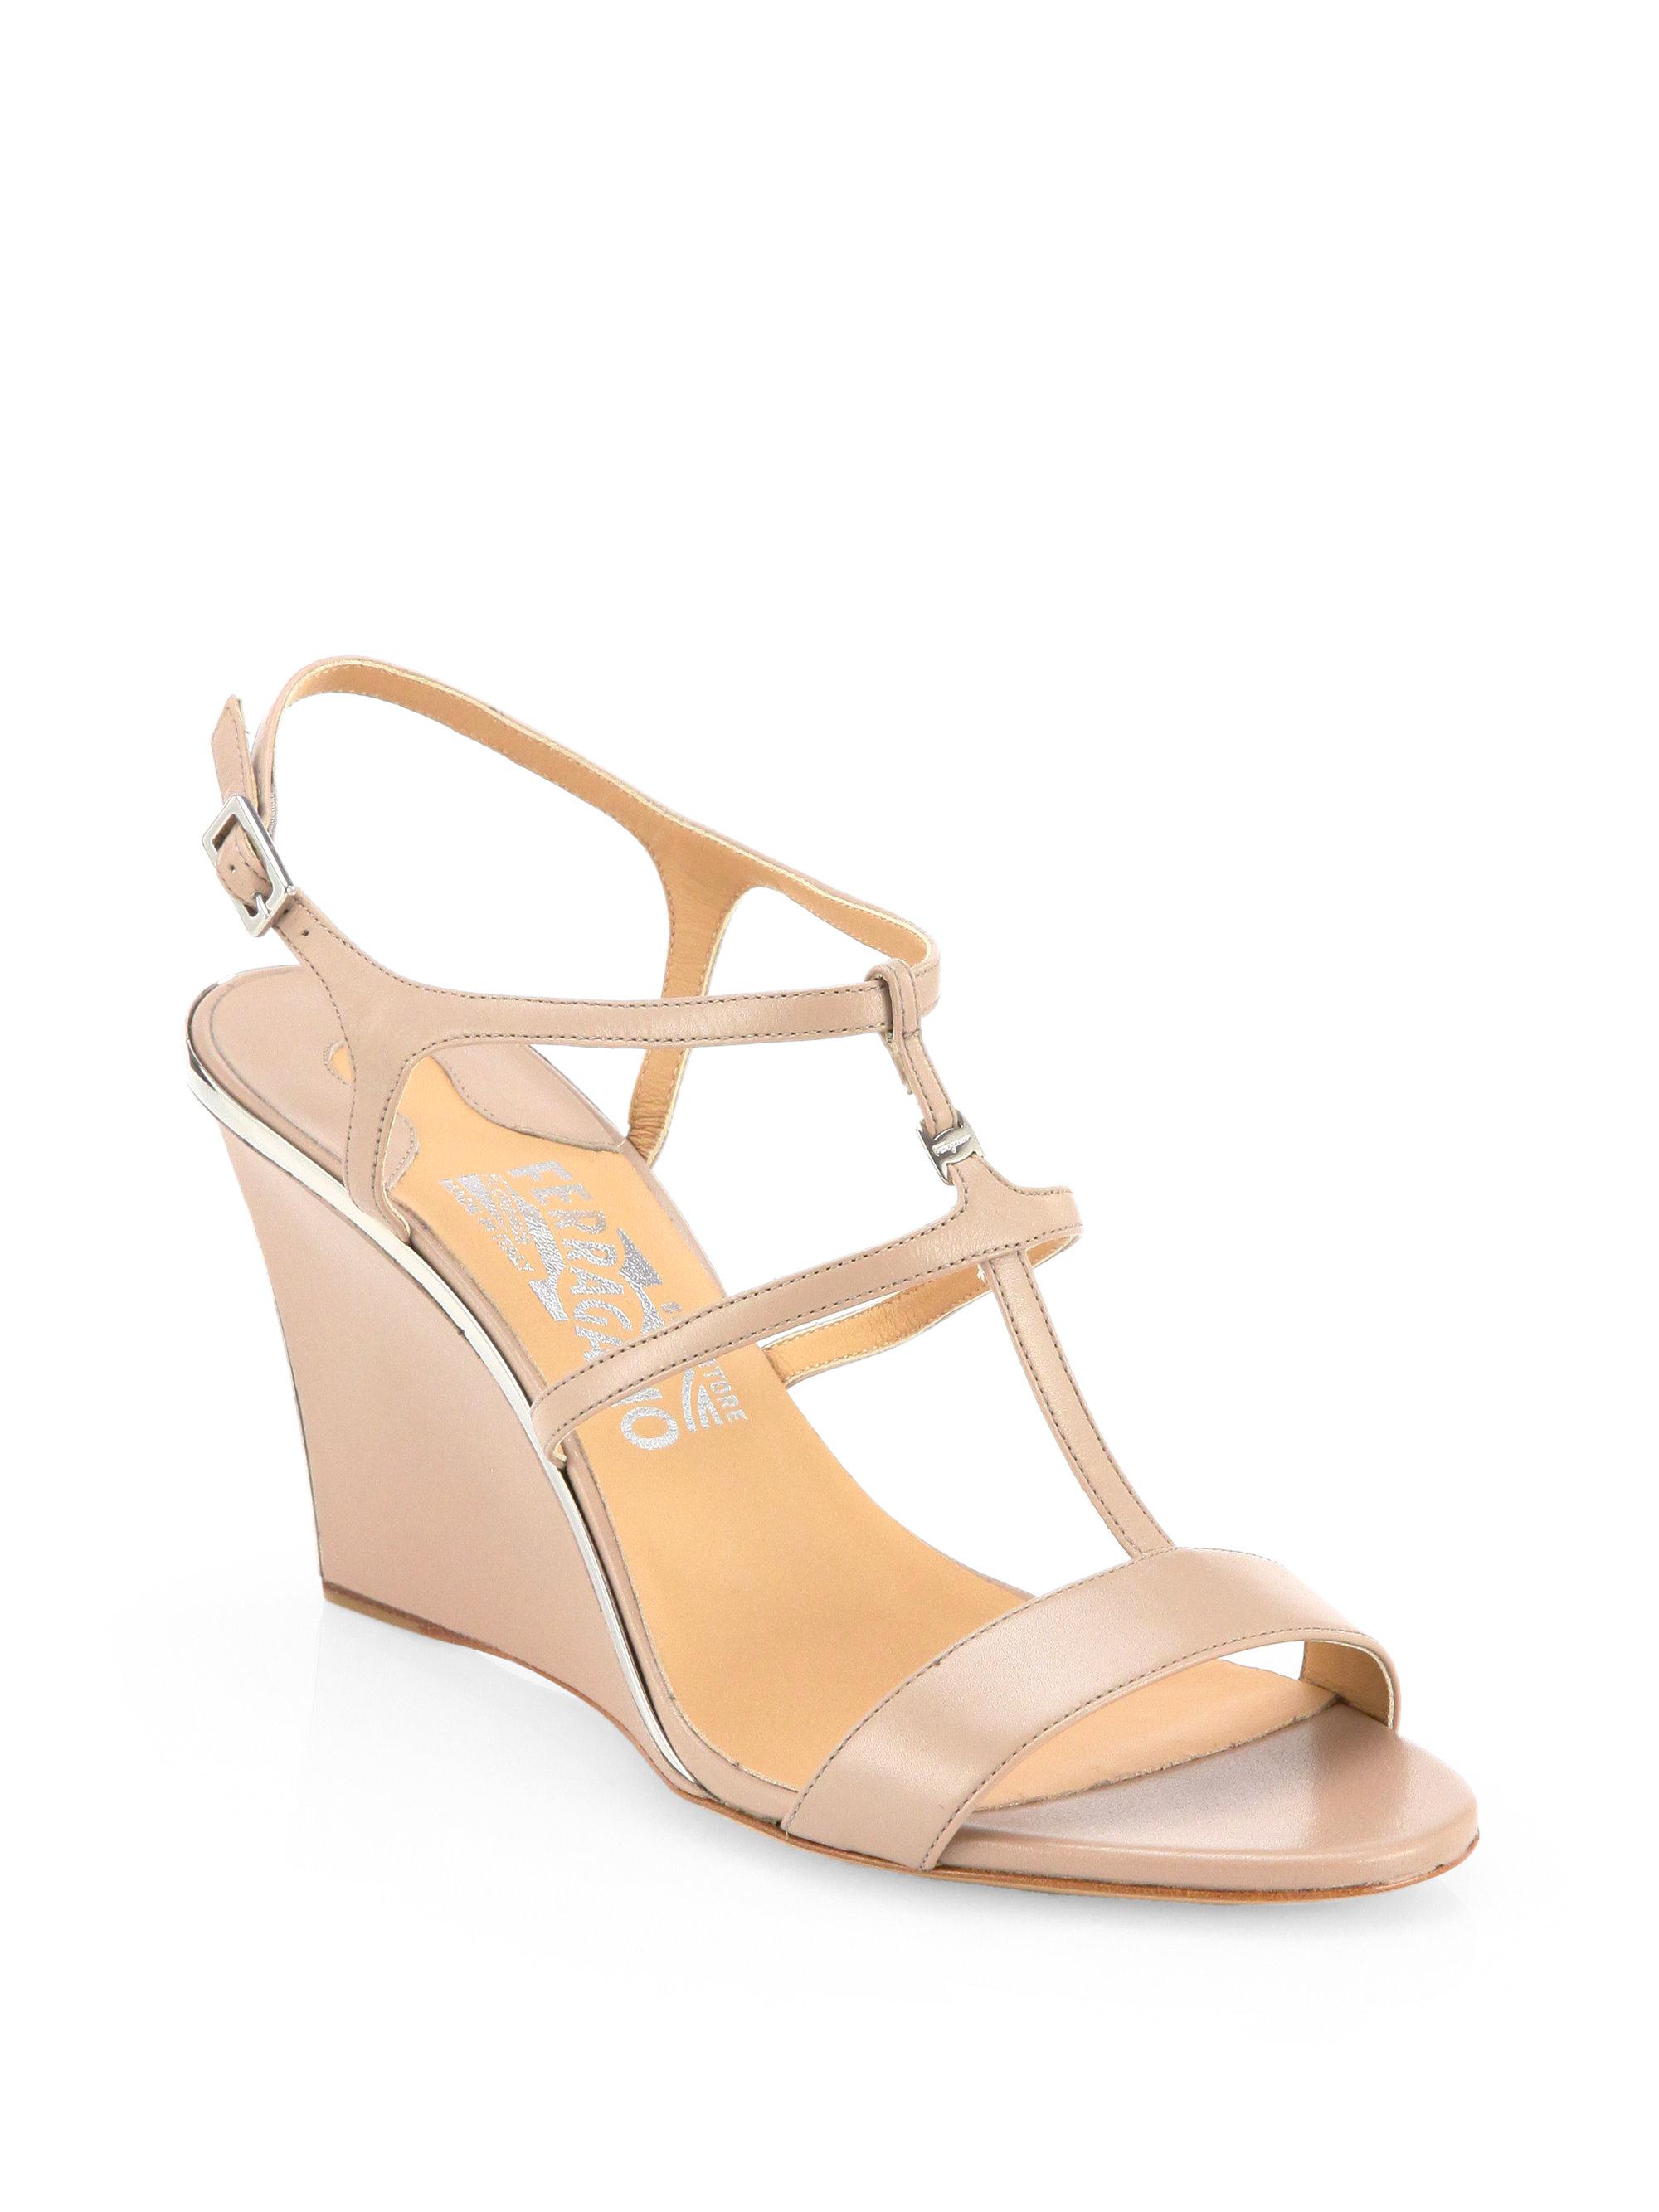 ferragamo pakuna leather wedge sandals in pink lyst